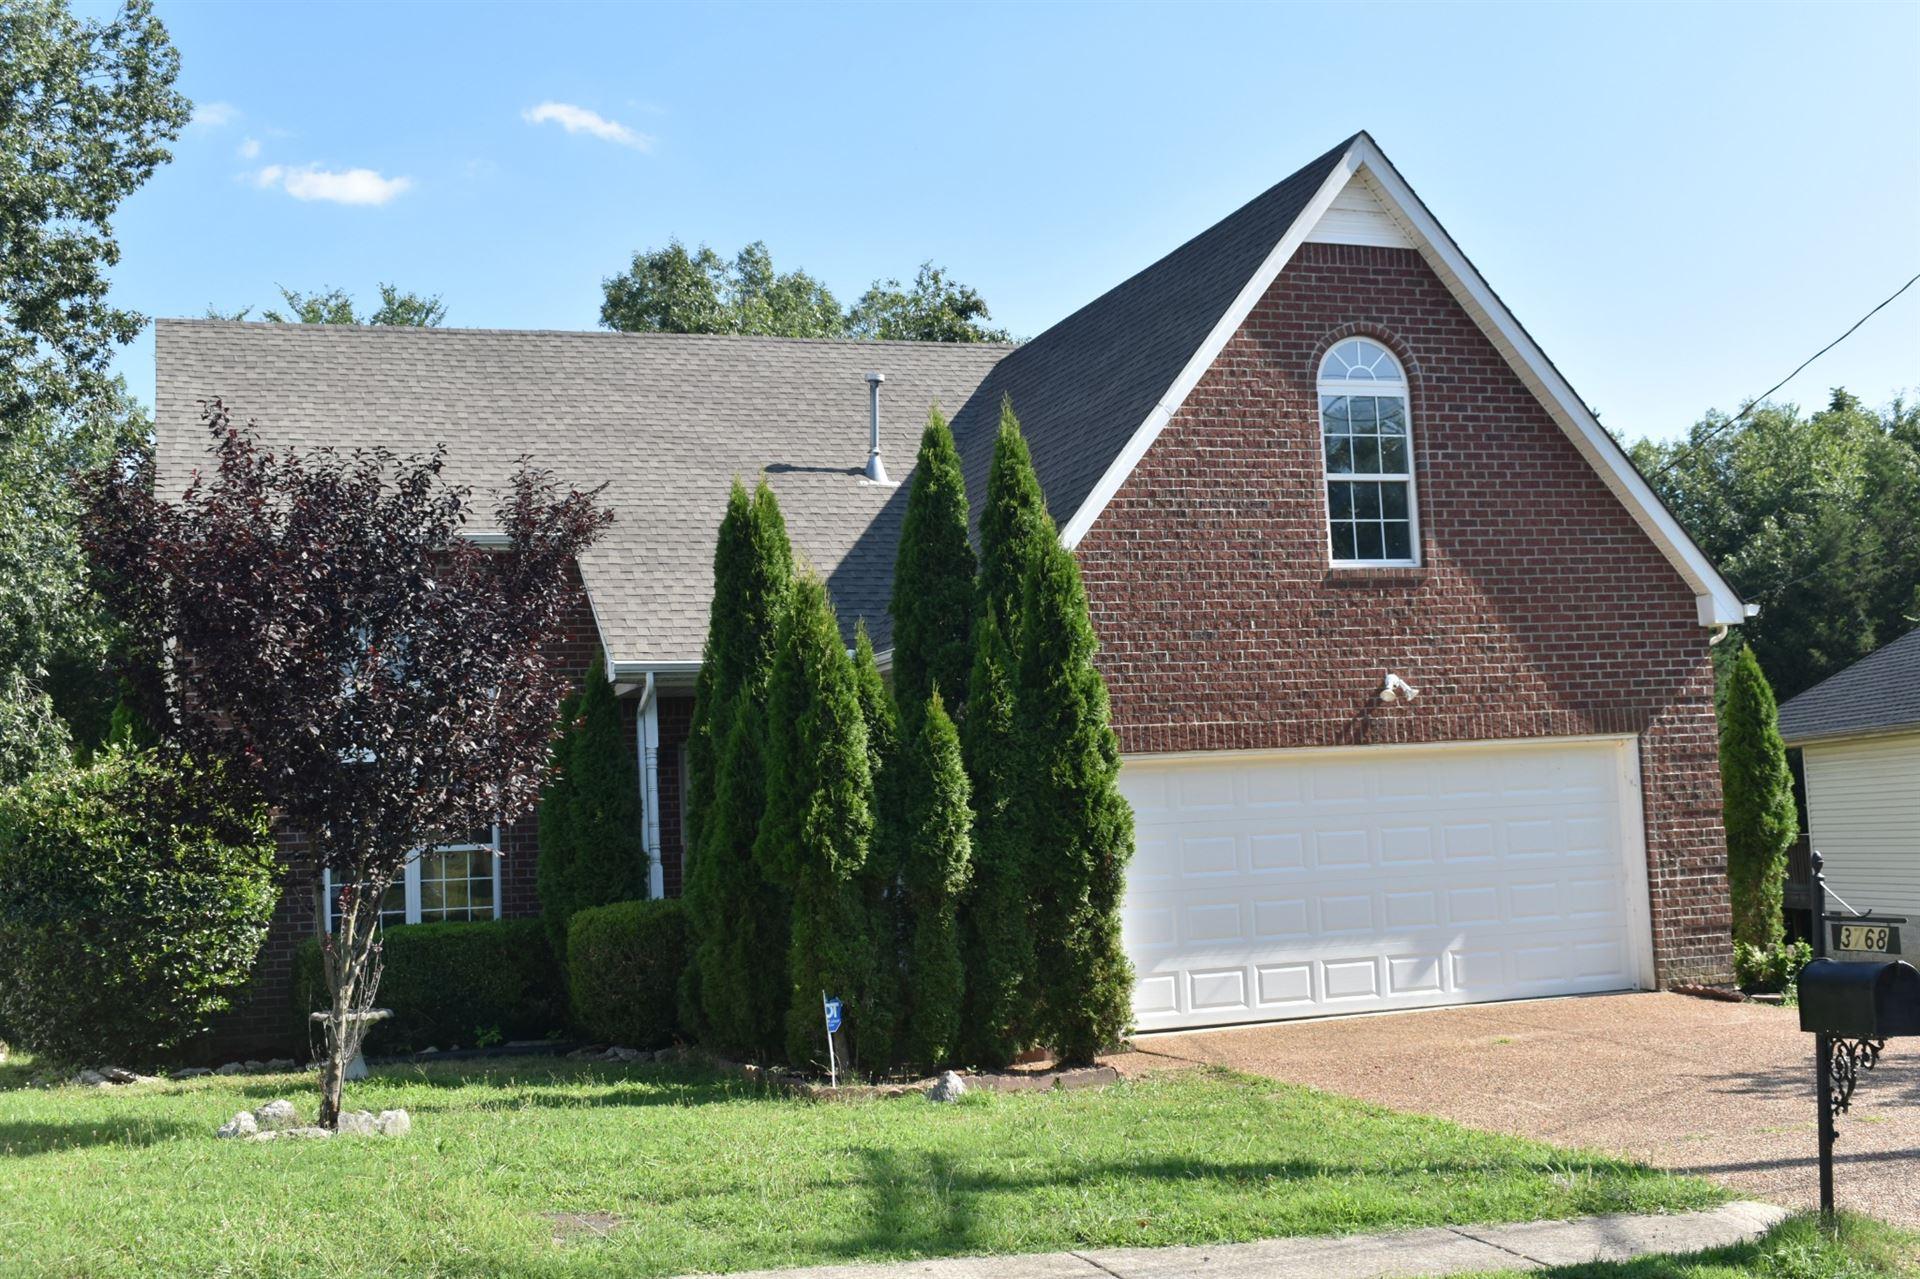 3768 Waterford Way, Antioch, TN 37013 - MLS#: 2173346